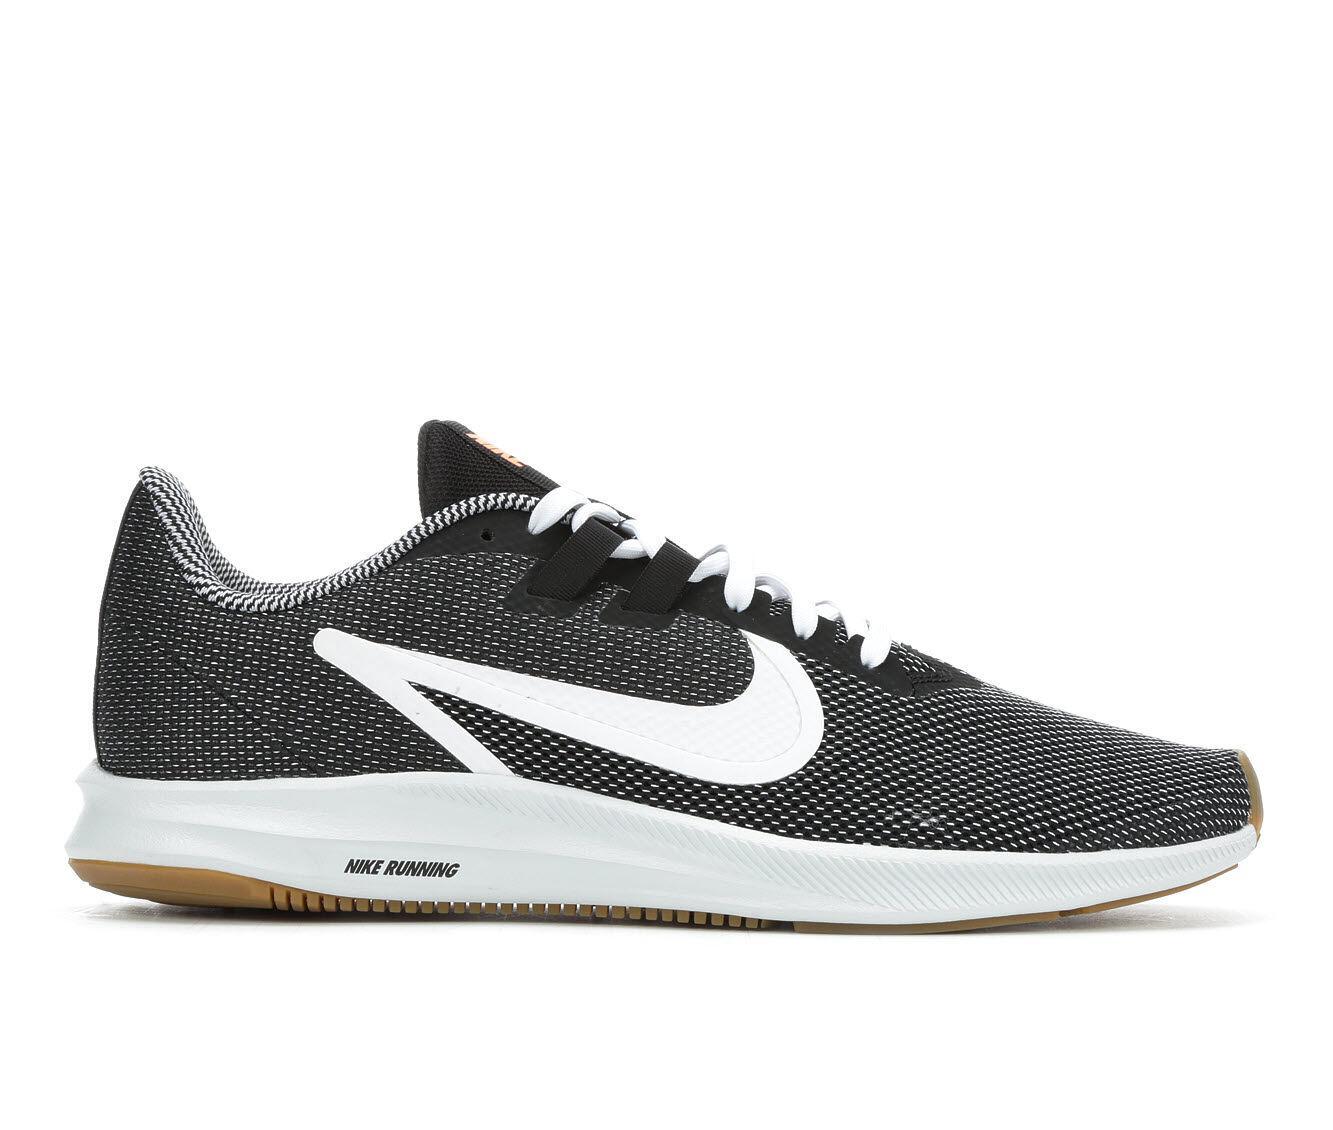 Men's Nike Downshifter 9 SE Running Shoes Blk/Wht/Gum 001